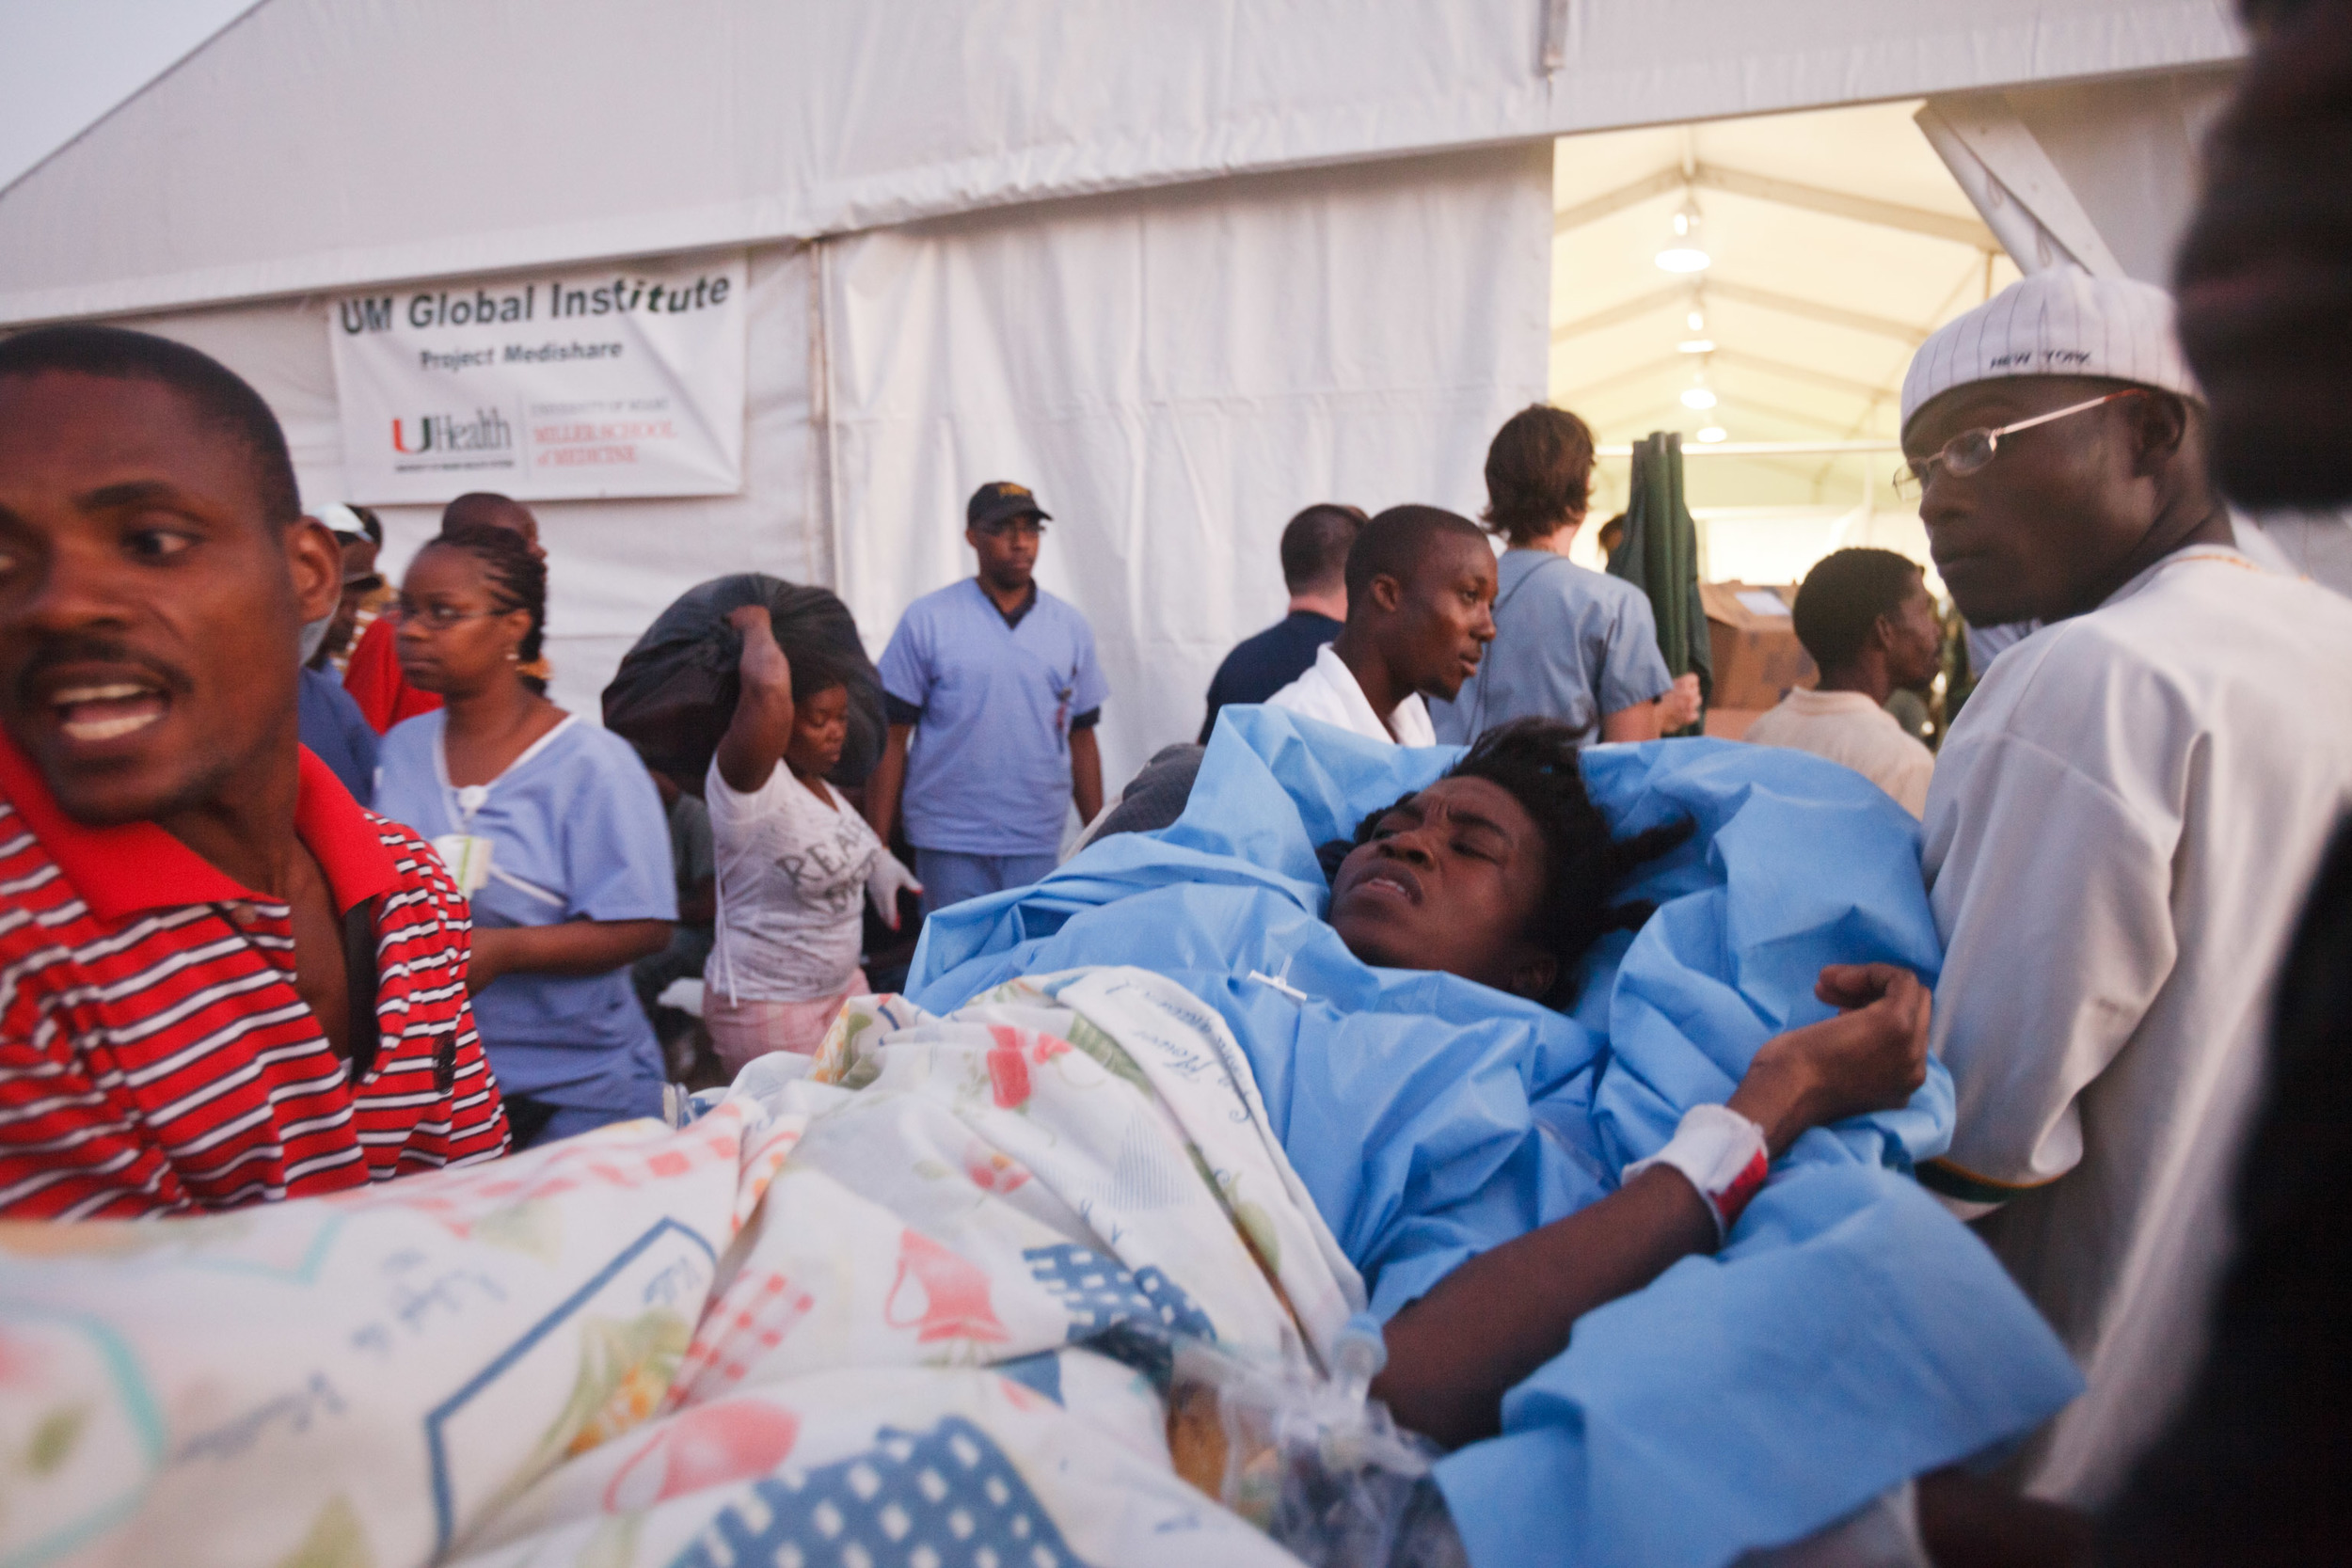 haiti-field-hospital_04.jpg